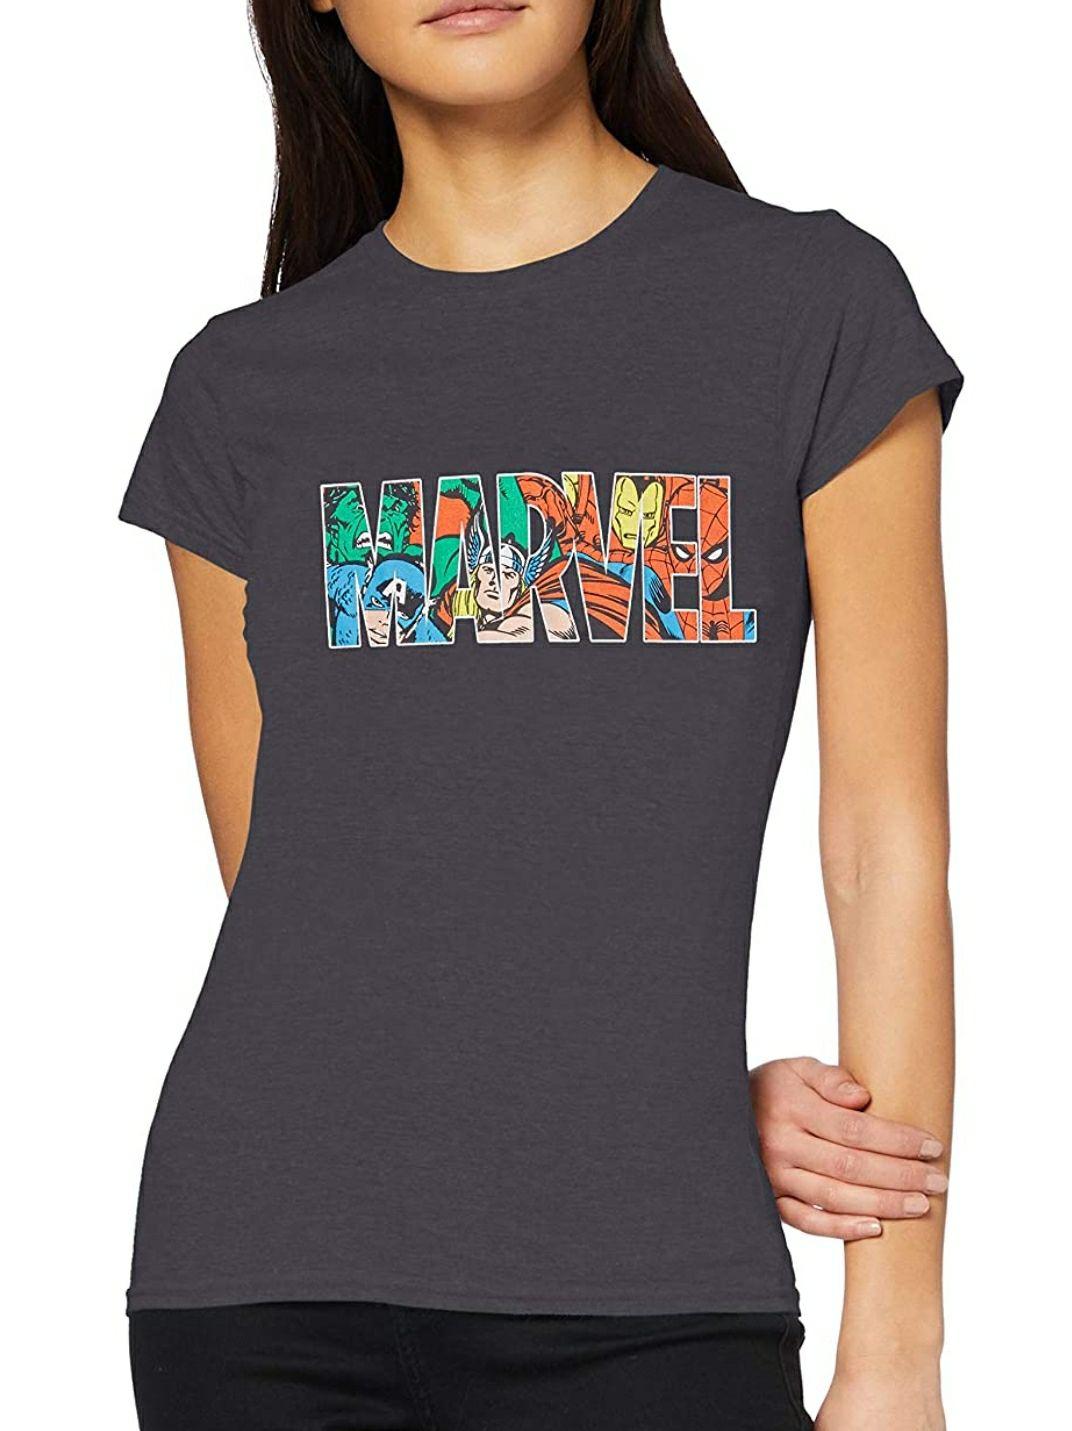 Camiseta MARVEL - Talla XXL